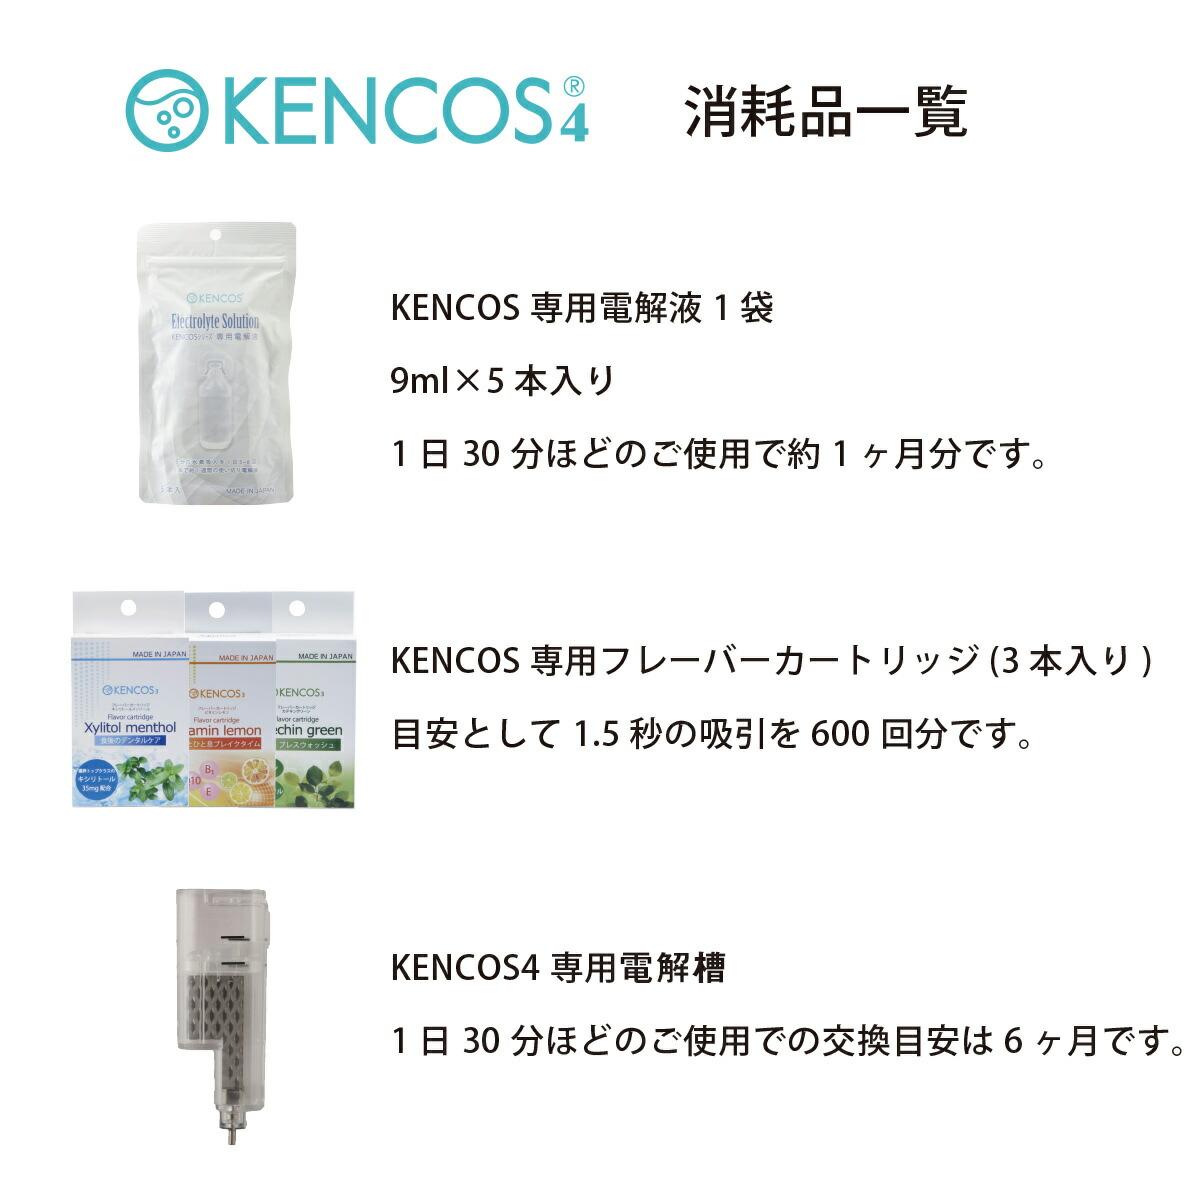 KENCOS消耗品 電解液 電解槽 フレーバーカートリッジ